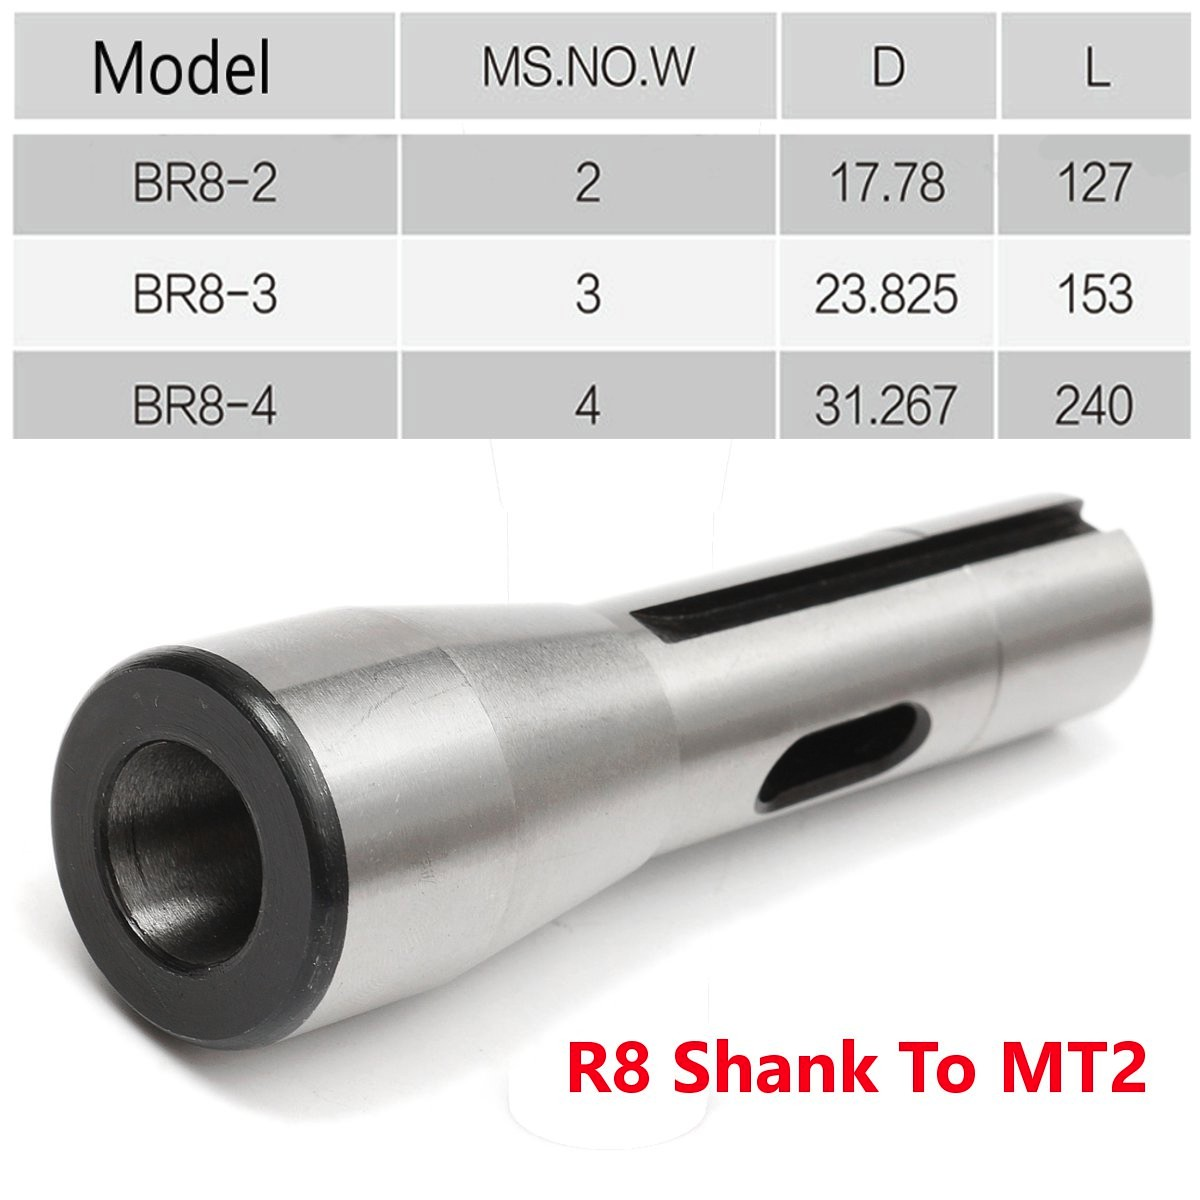 R8 SHANK-2MT DRILL CHUCK ARBOR ADAPTER SLEEVE FIT BRIDGEPORT MT2 MORSE TAPER